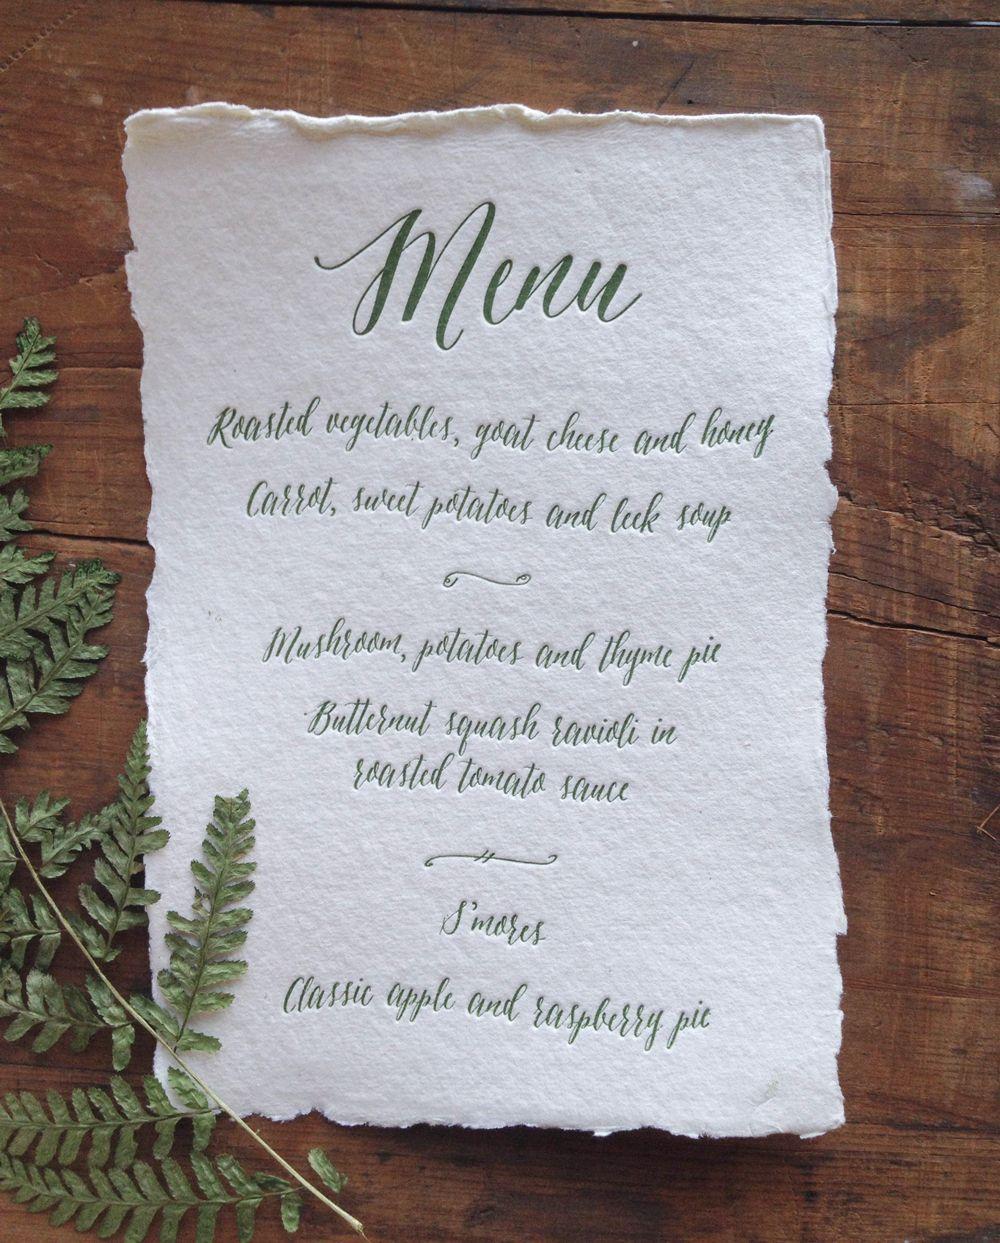 Botanical wedding menu wedding botanical pinterest